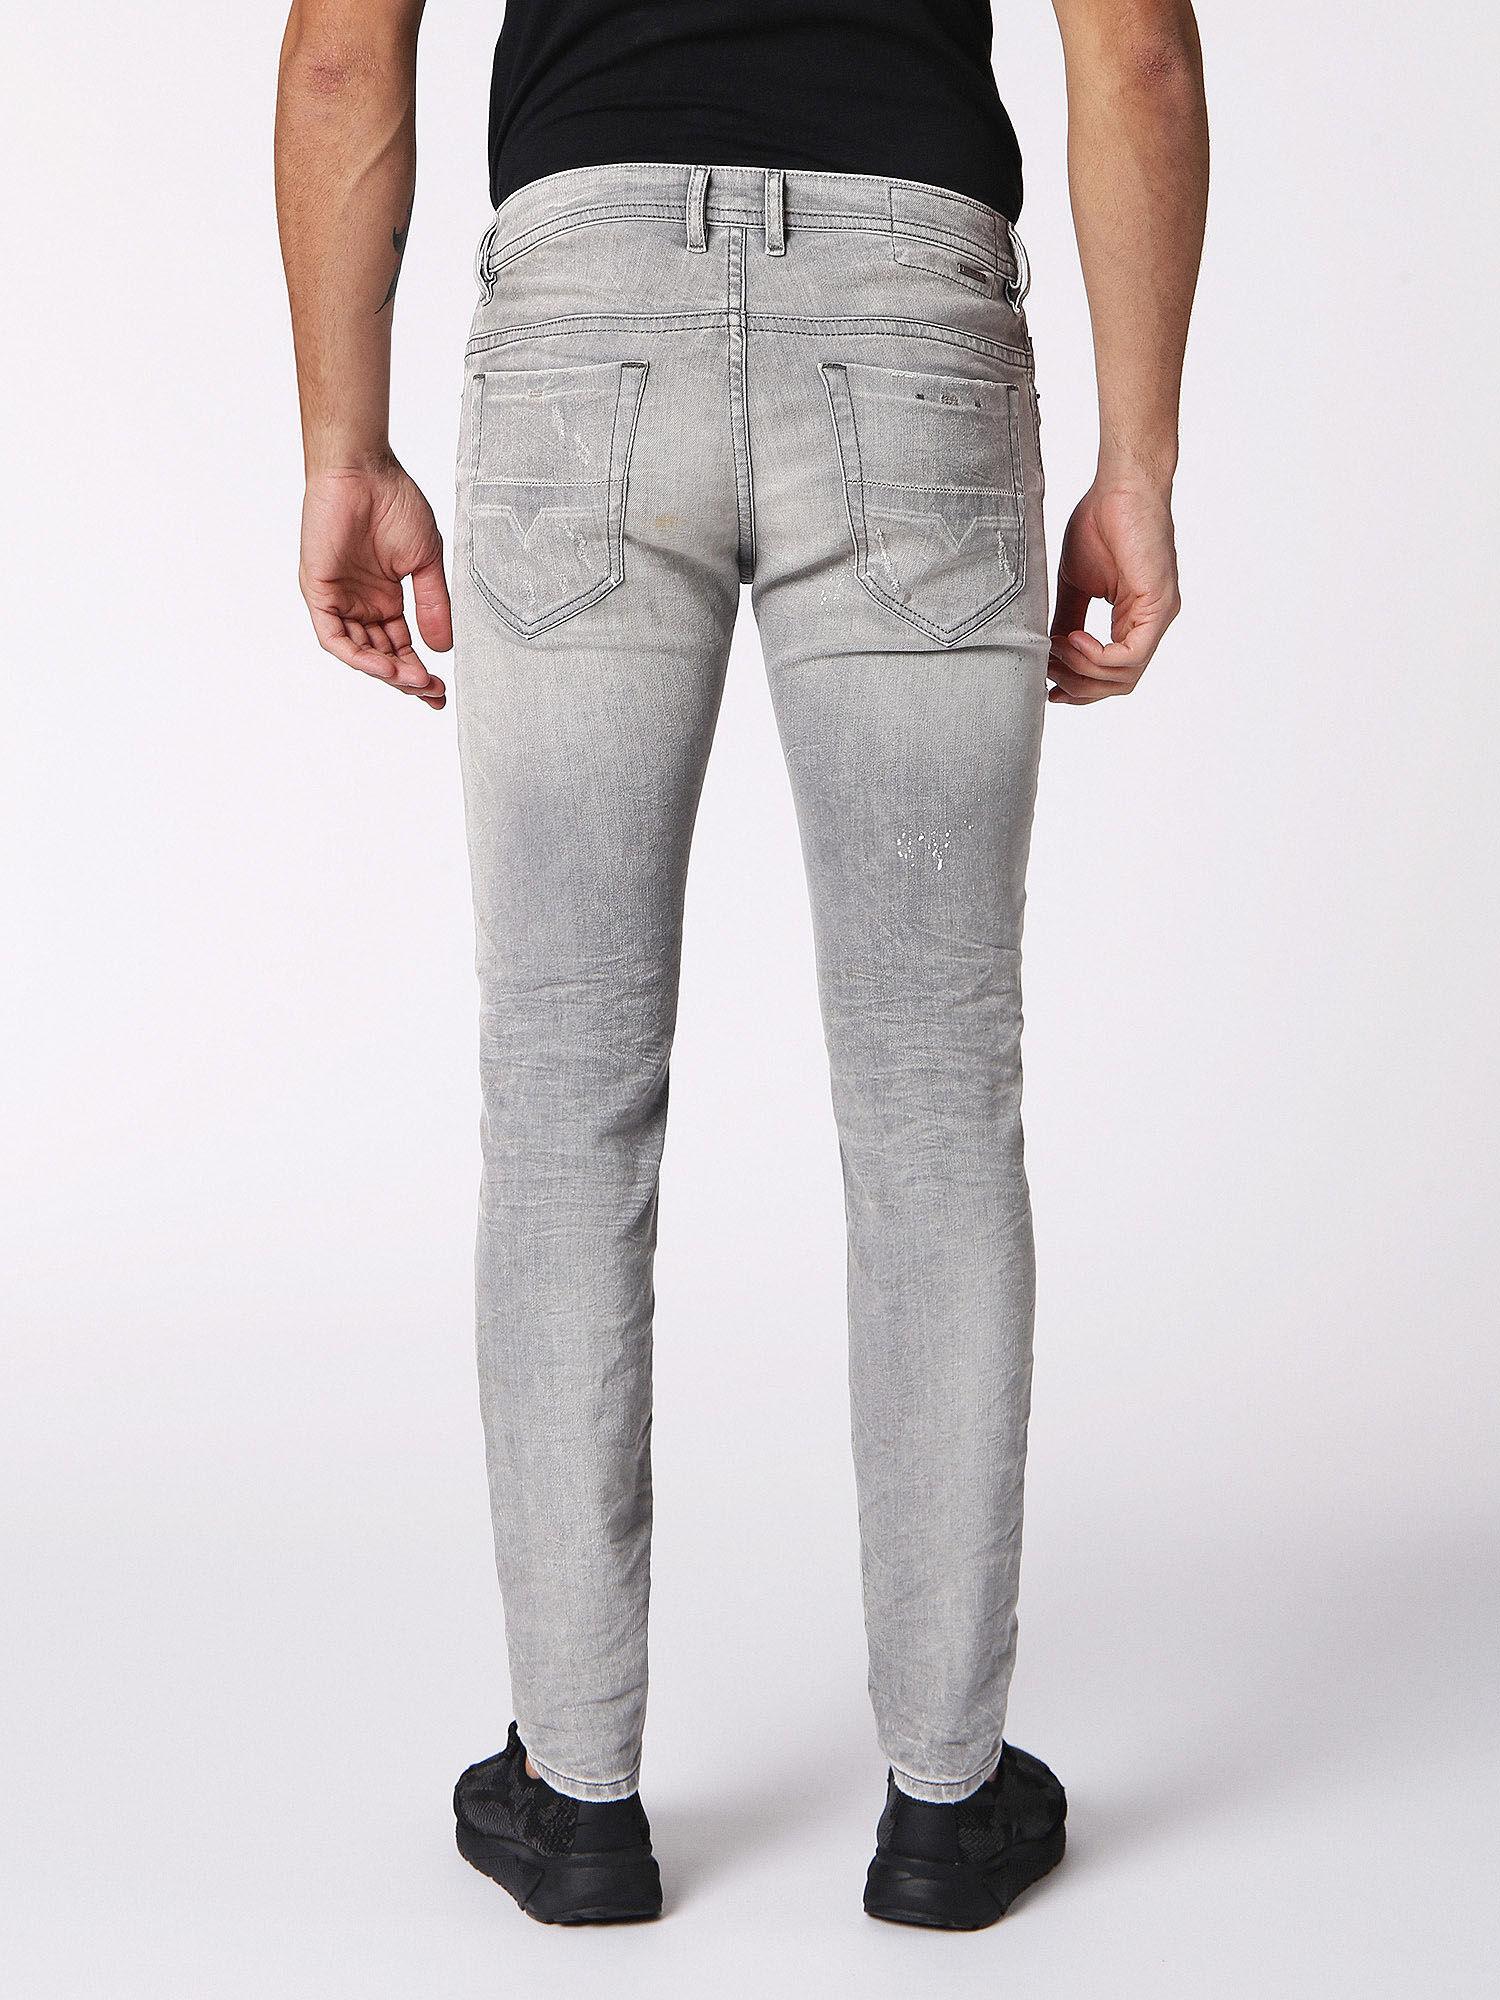 THOMMER 0699J, Grey Jeans ...